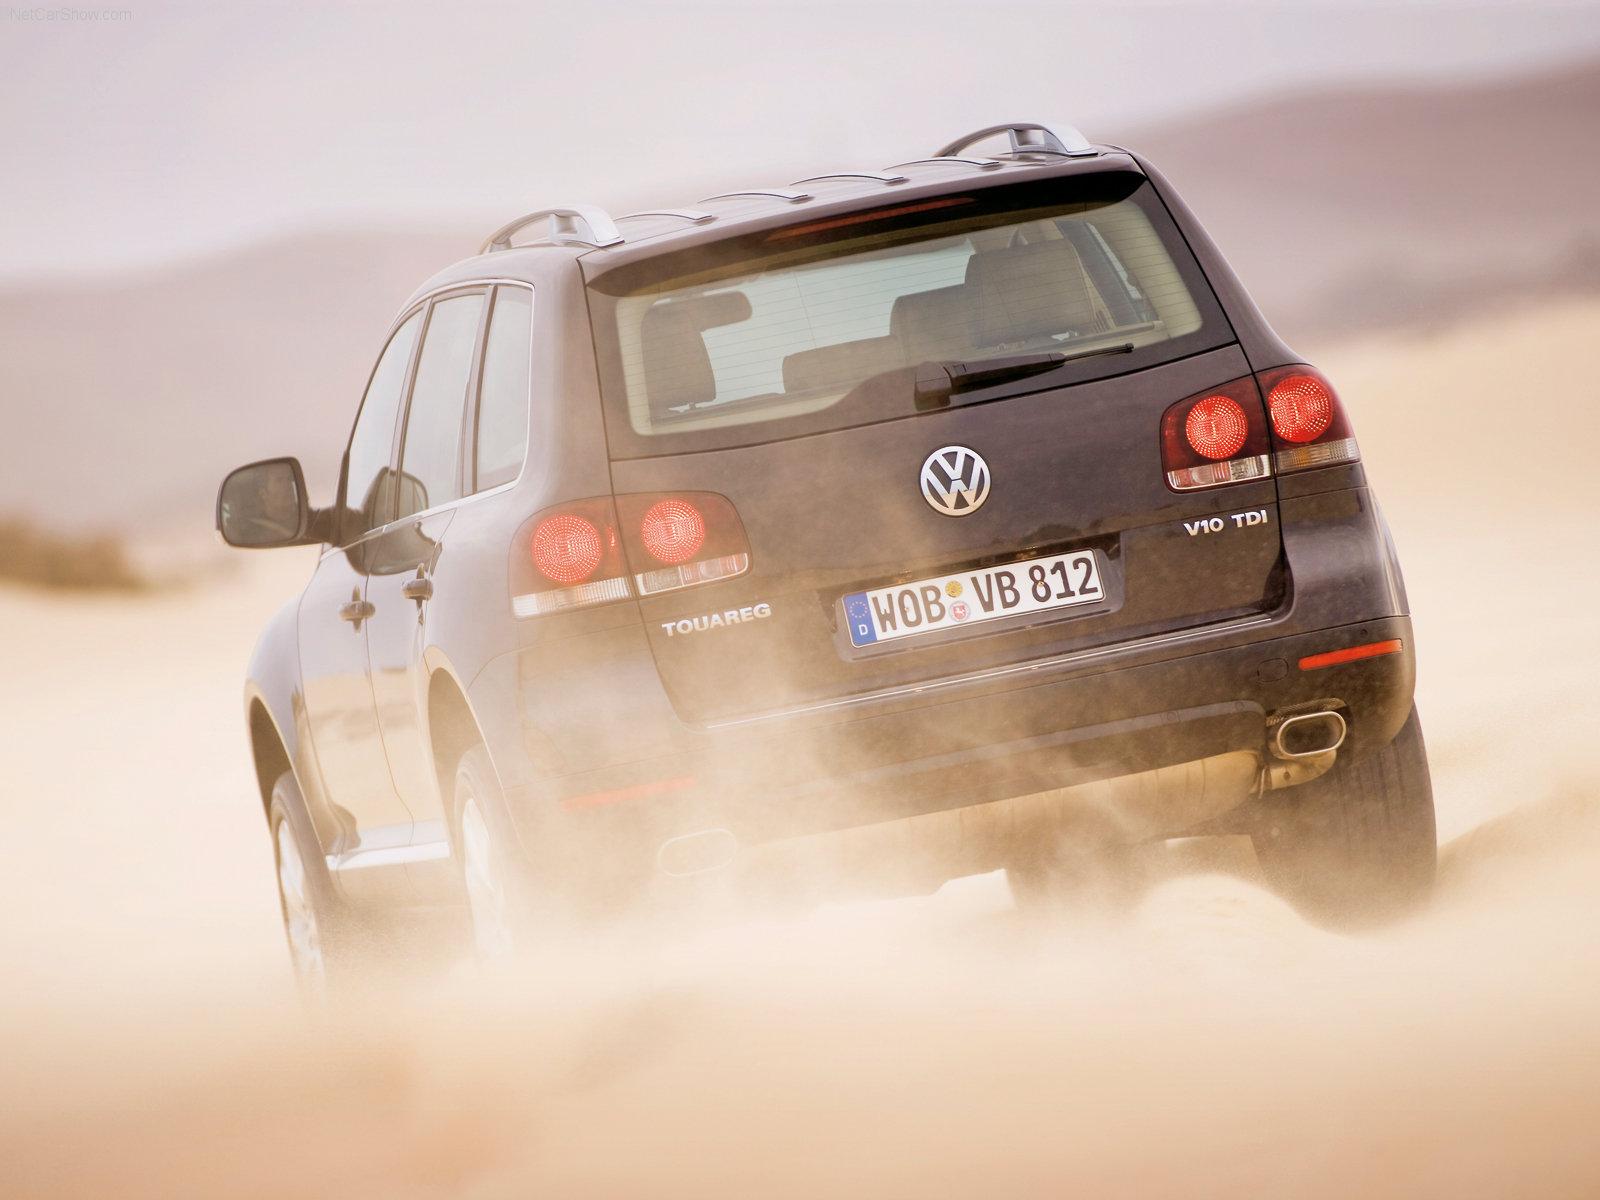 http://w04.ru/foto/Volkswagen-Touareg_2007_1600x1200_wallpaper_1b.jpg